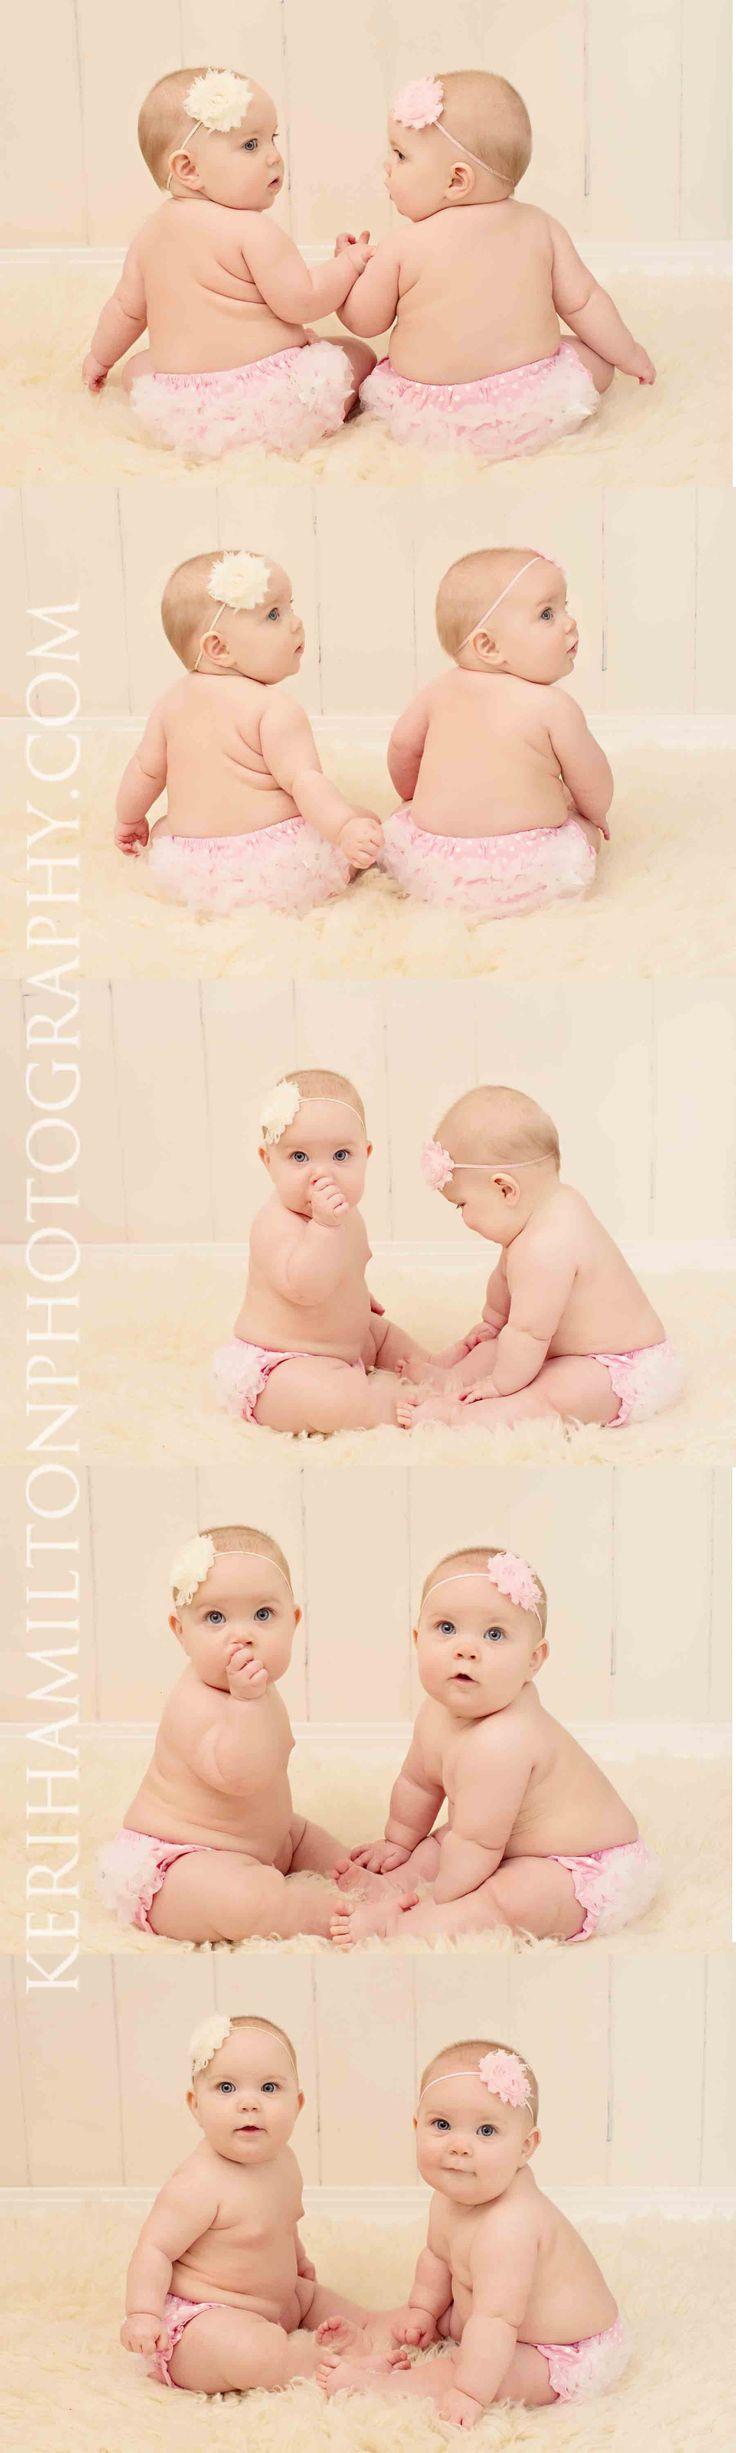 6 month twins http://kerihamiltonphotography.com http://facebook.com/kerihamiltonphotography